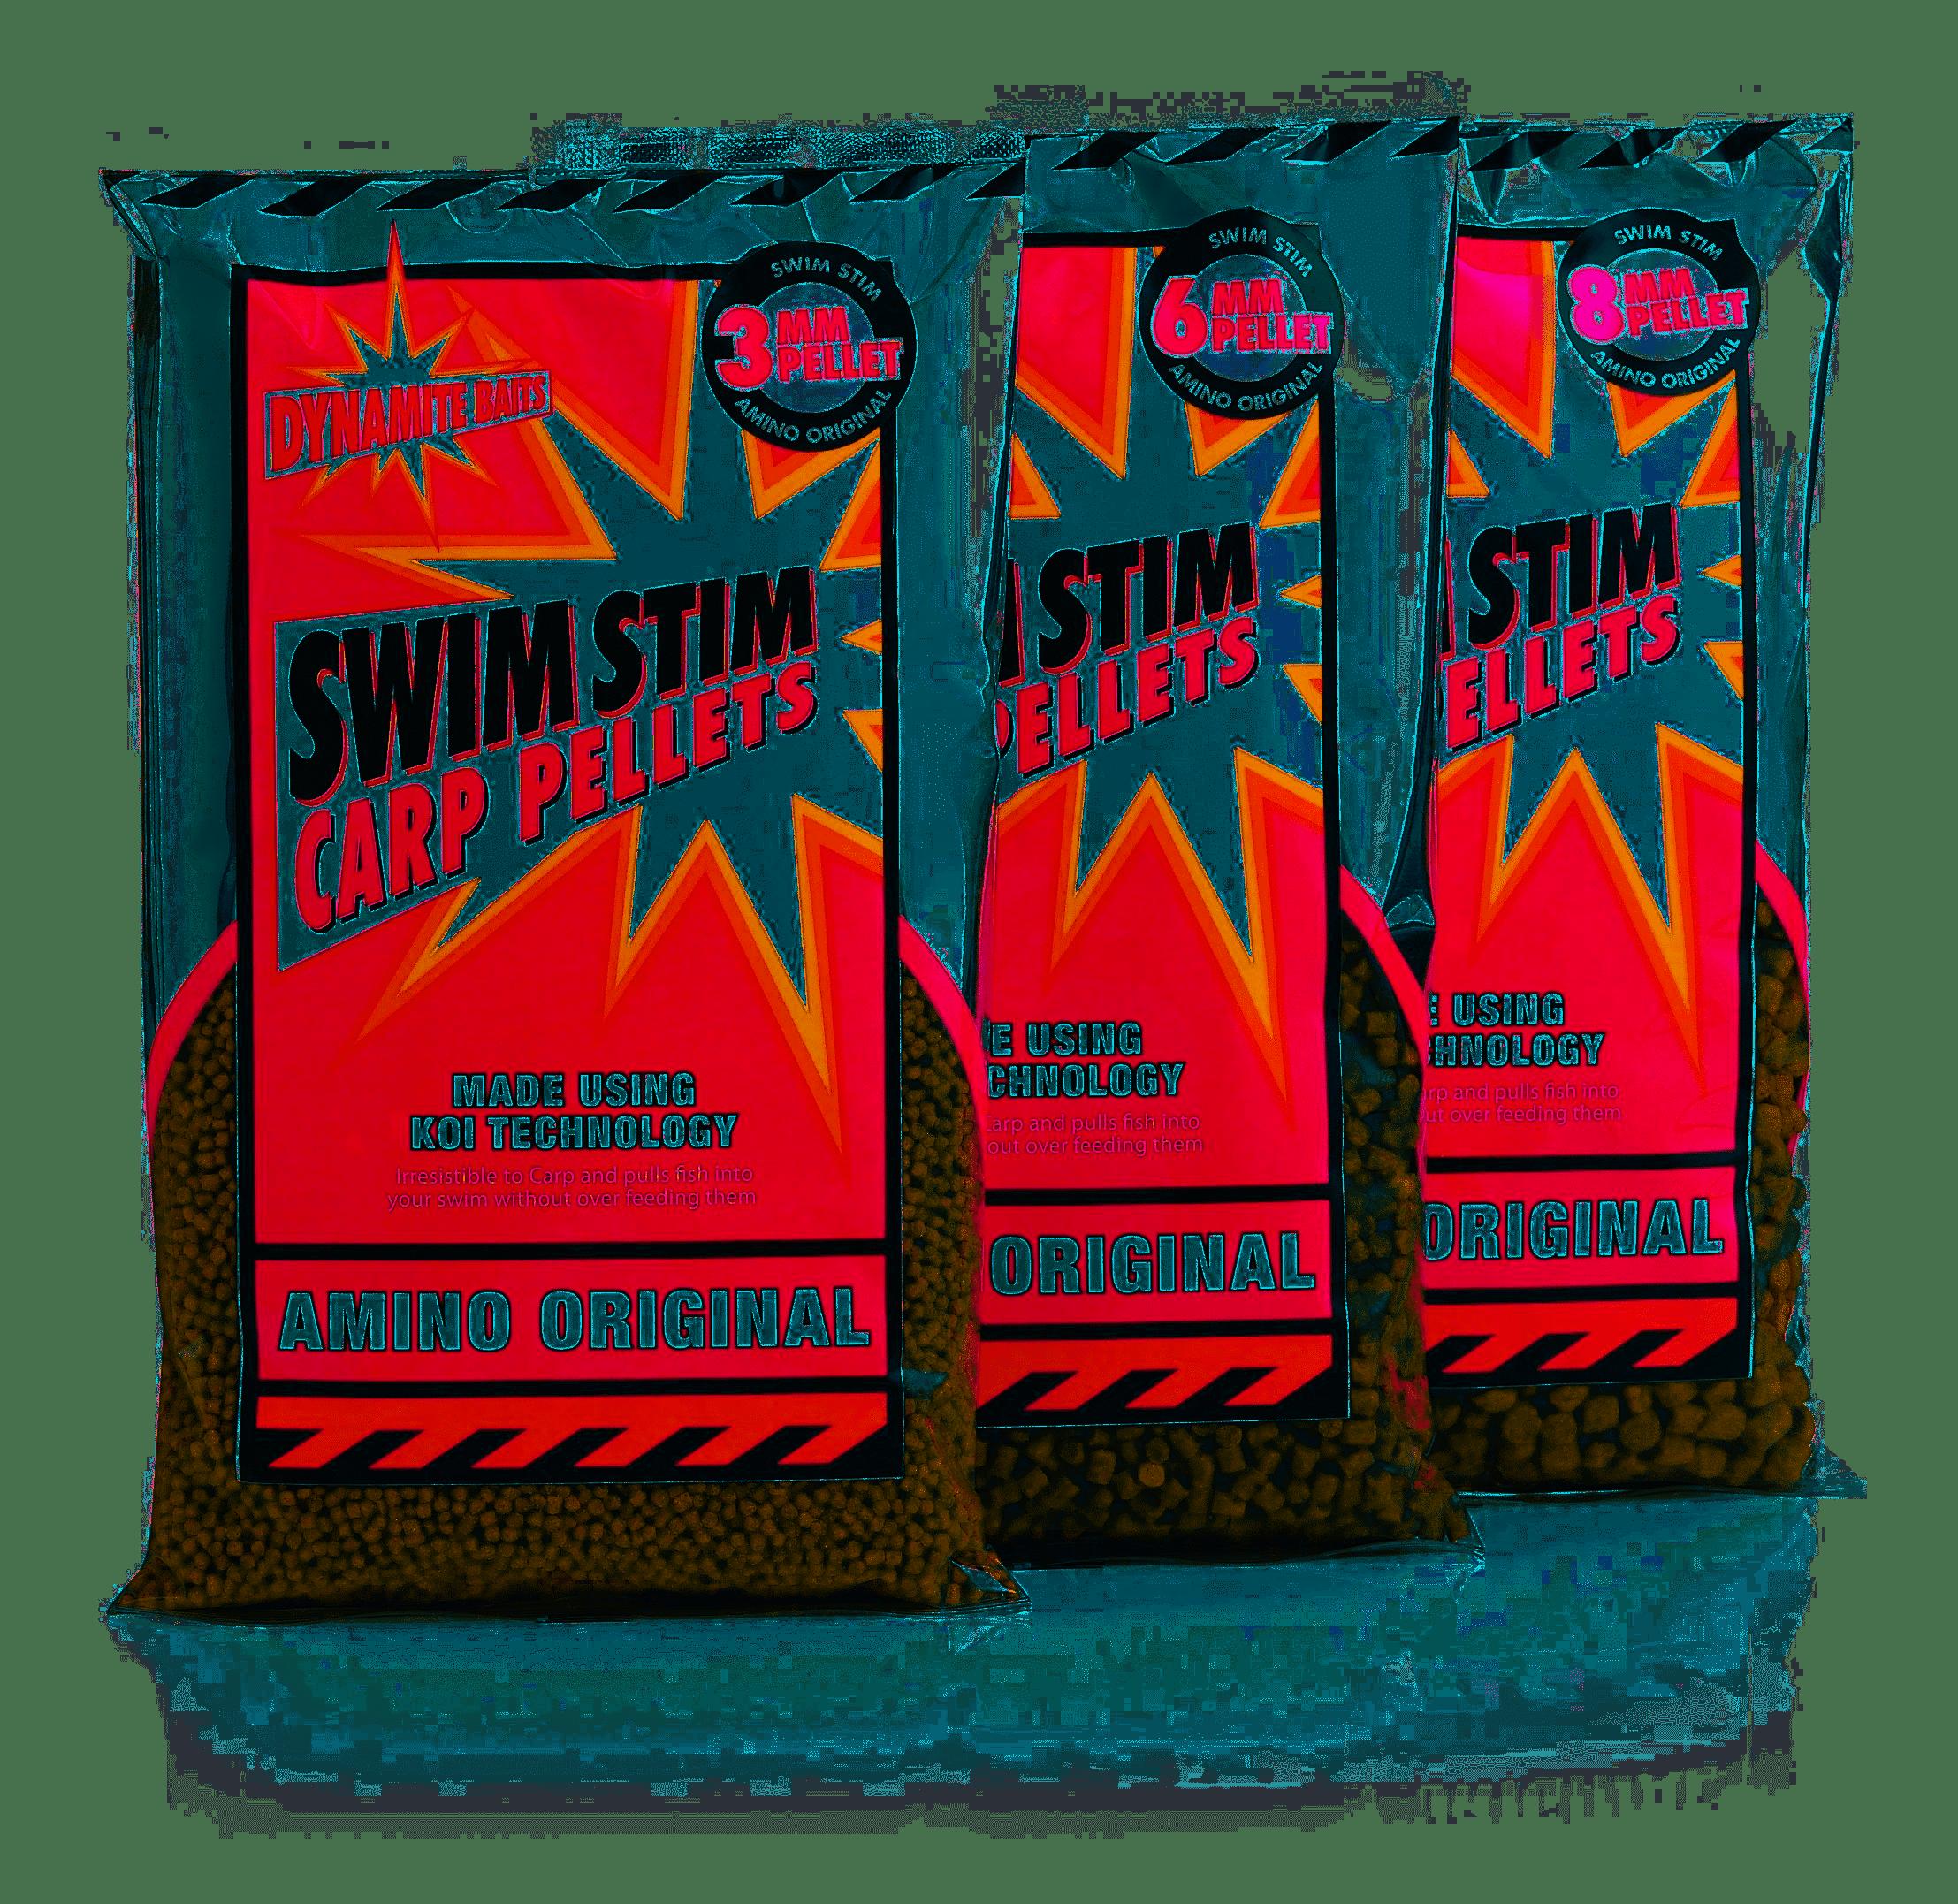 Dynamite Swim Stim Amino Original Pellets